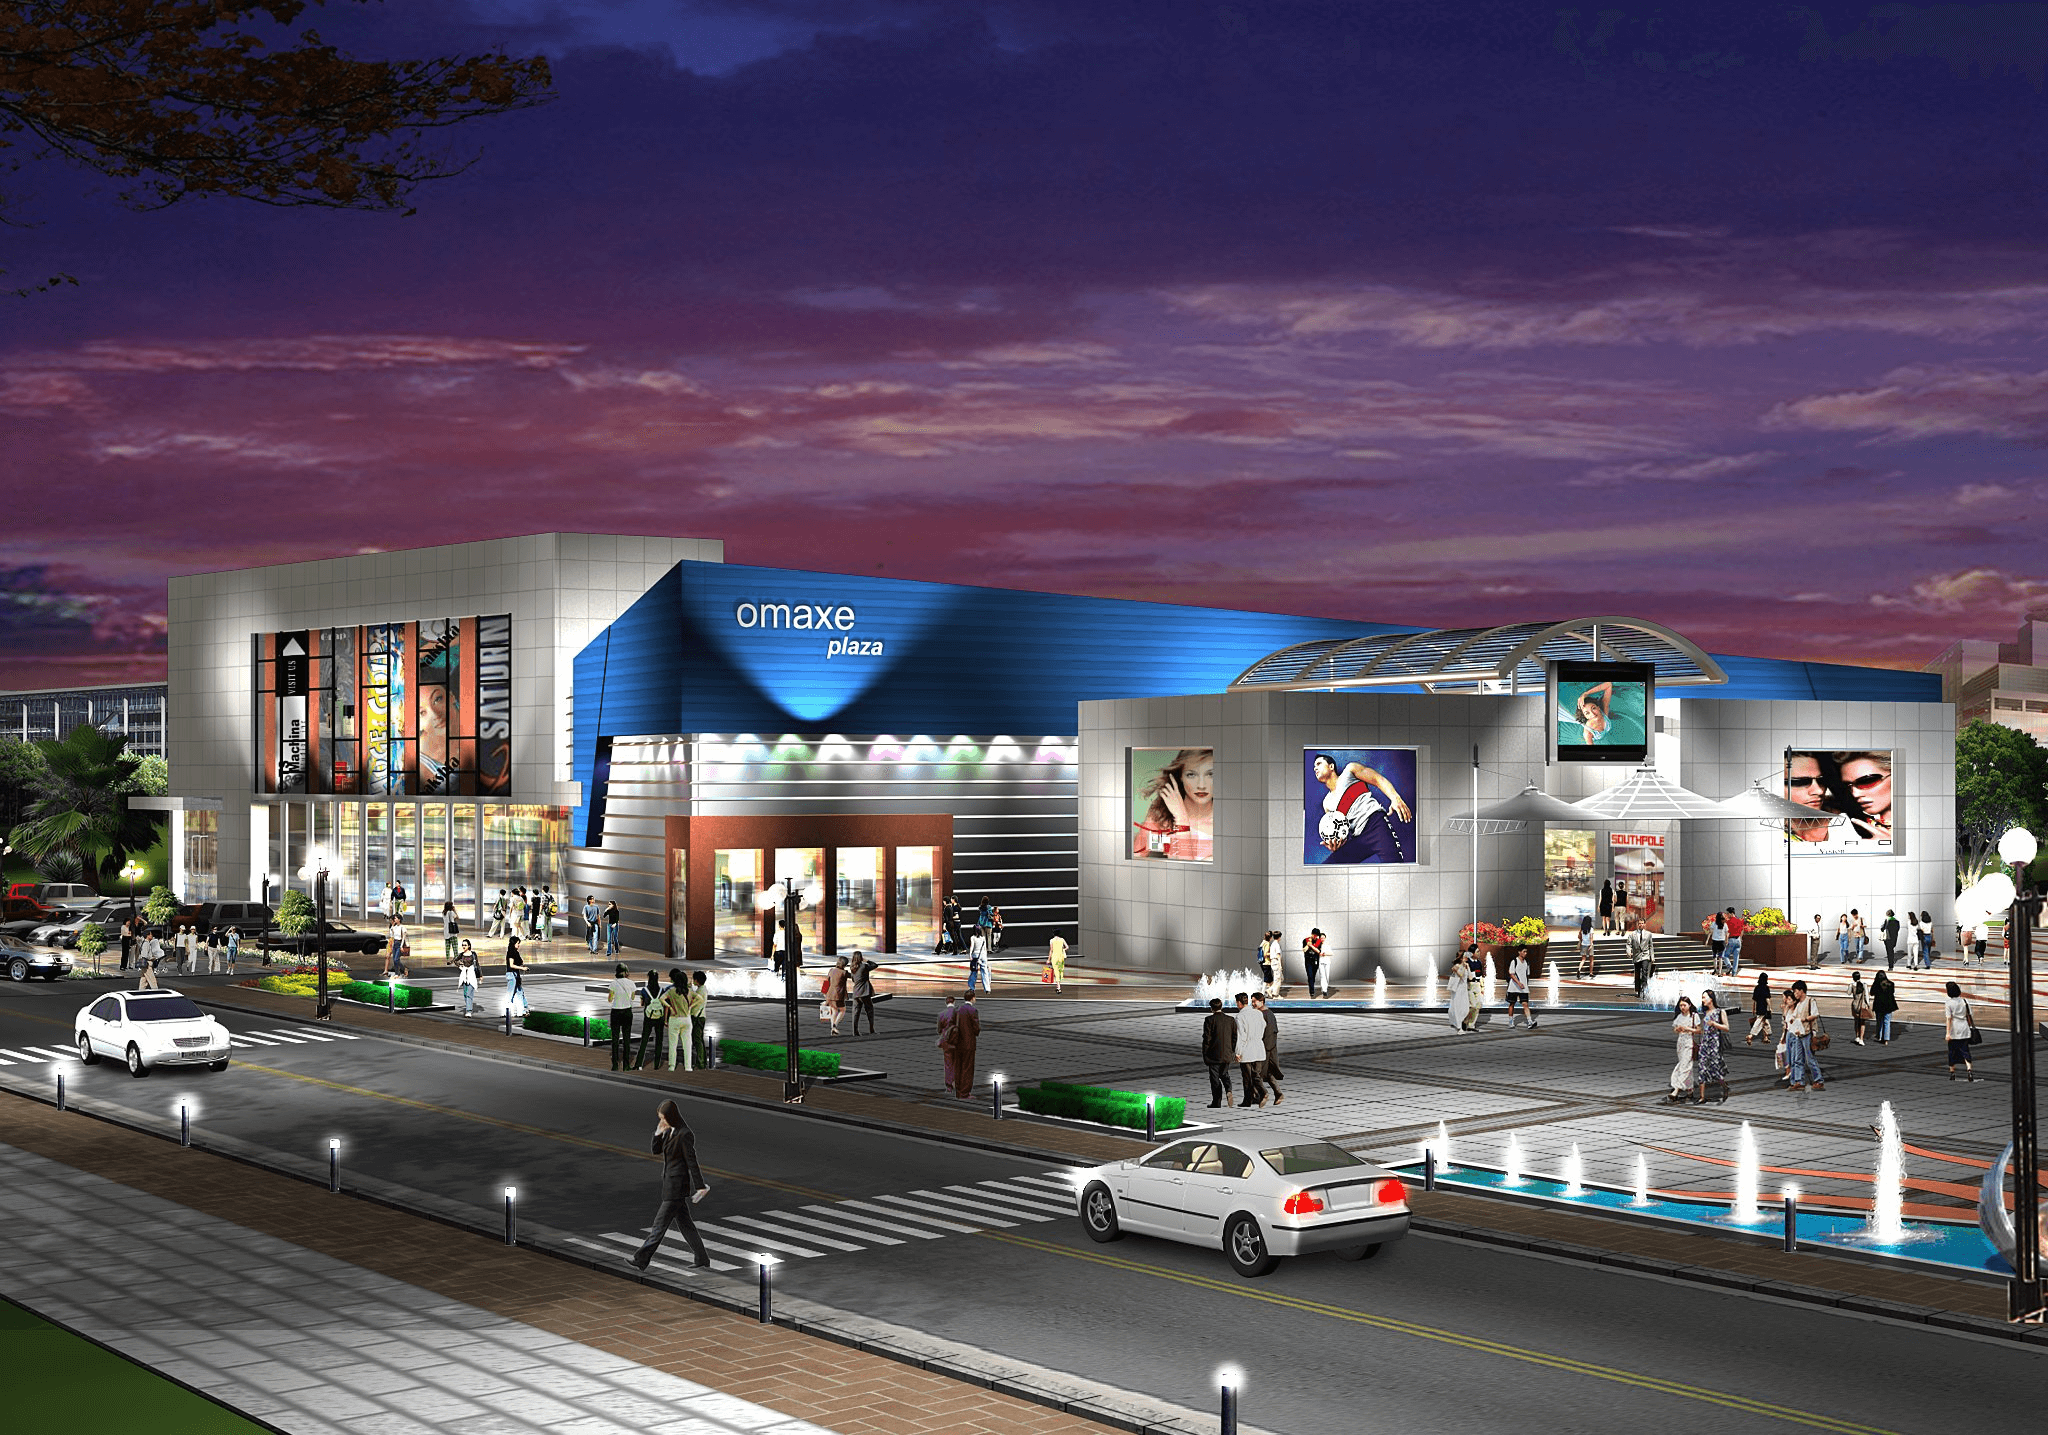 Omaxe mall sonipat Night (1)